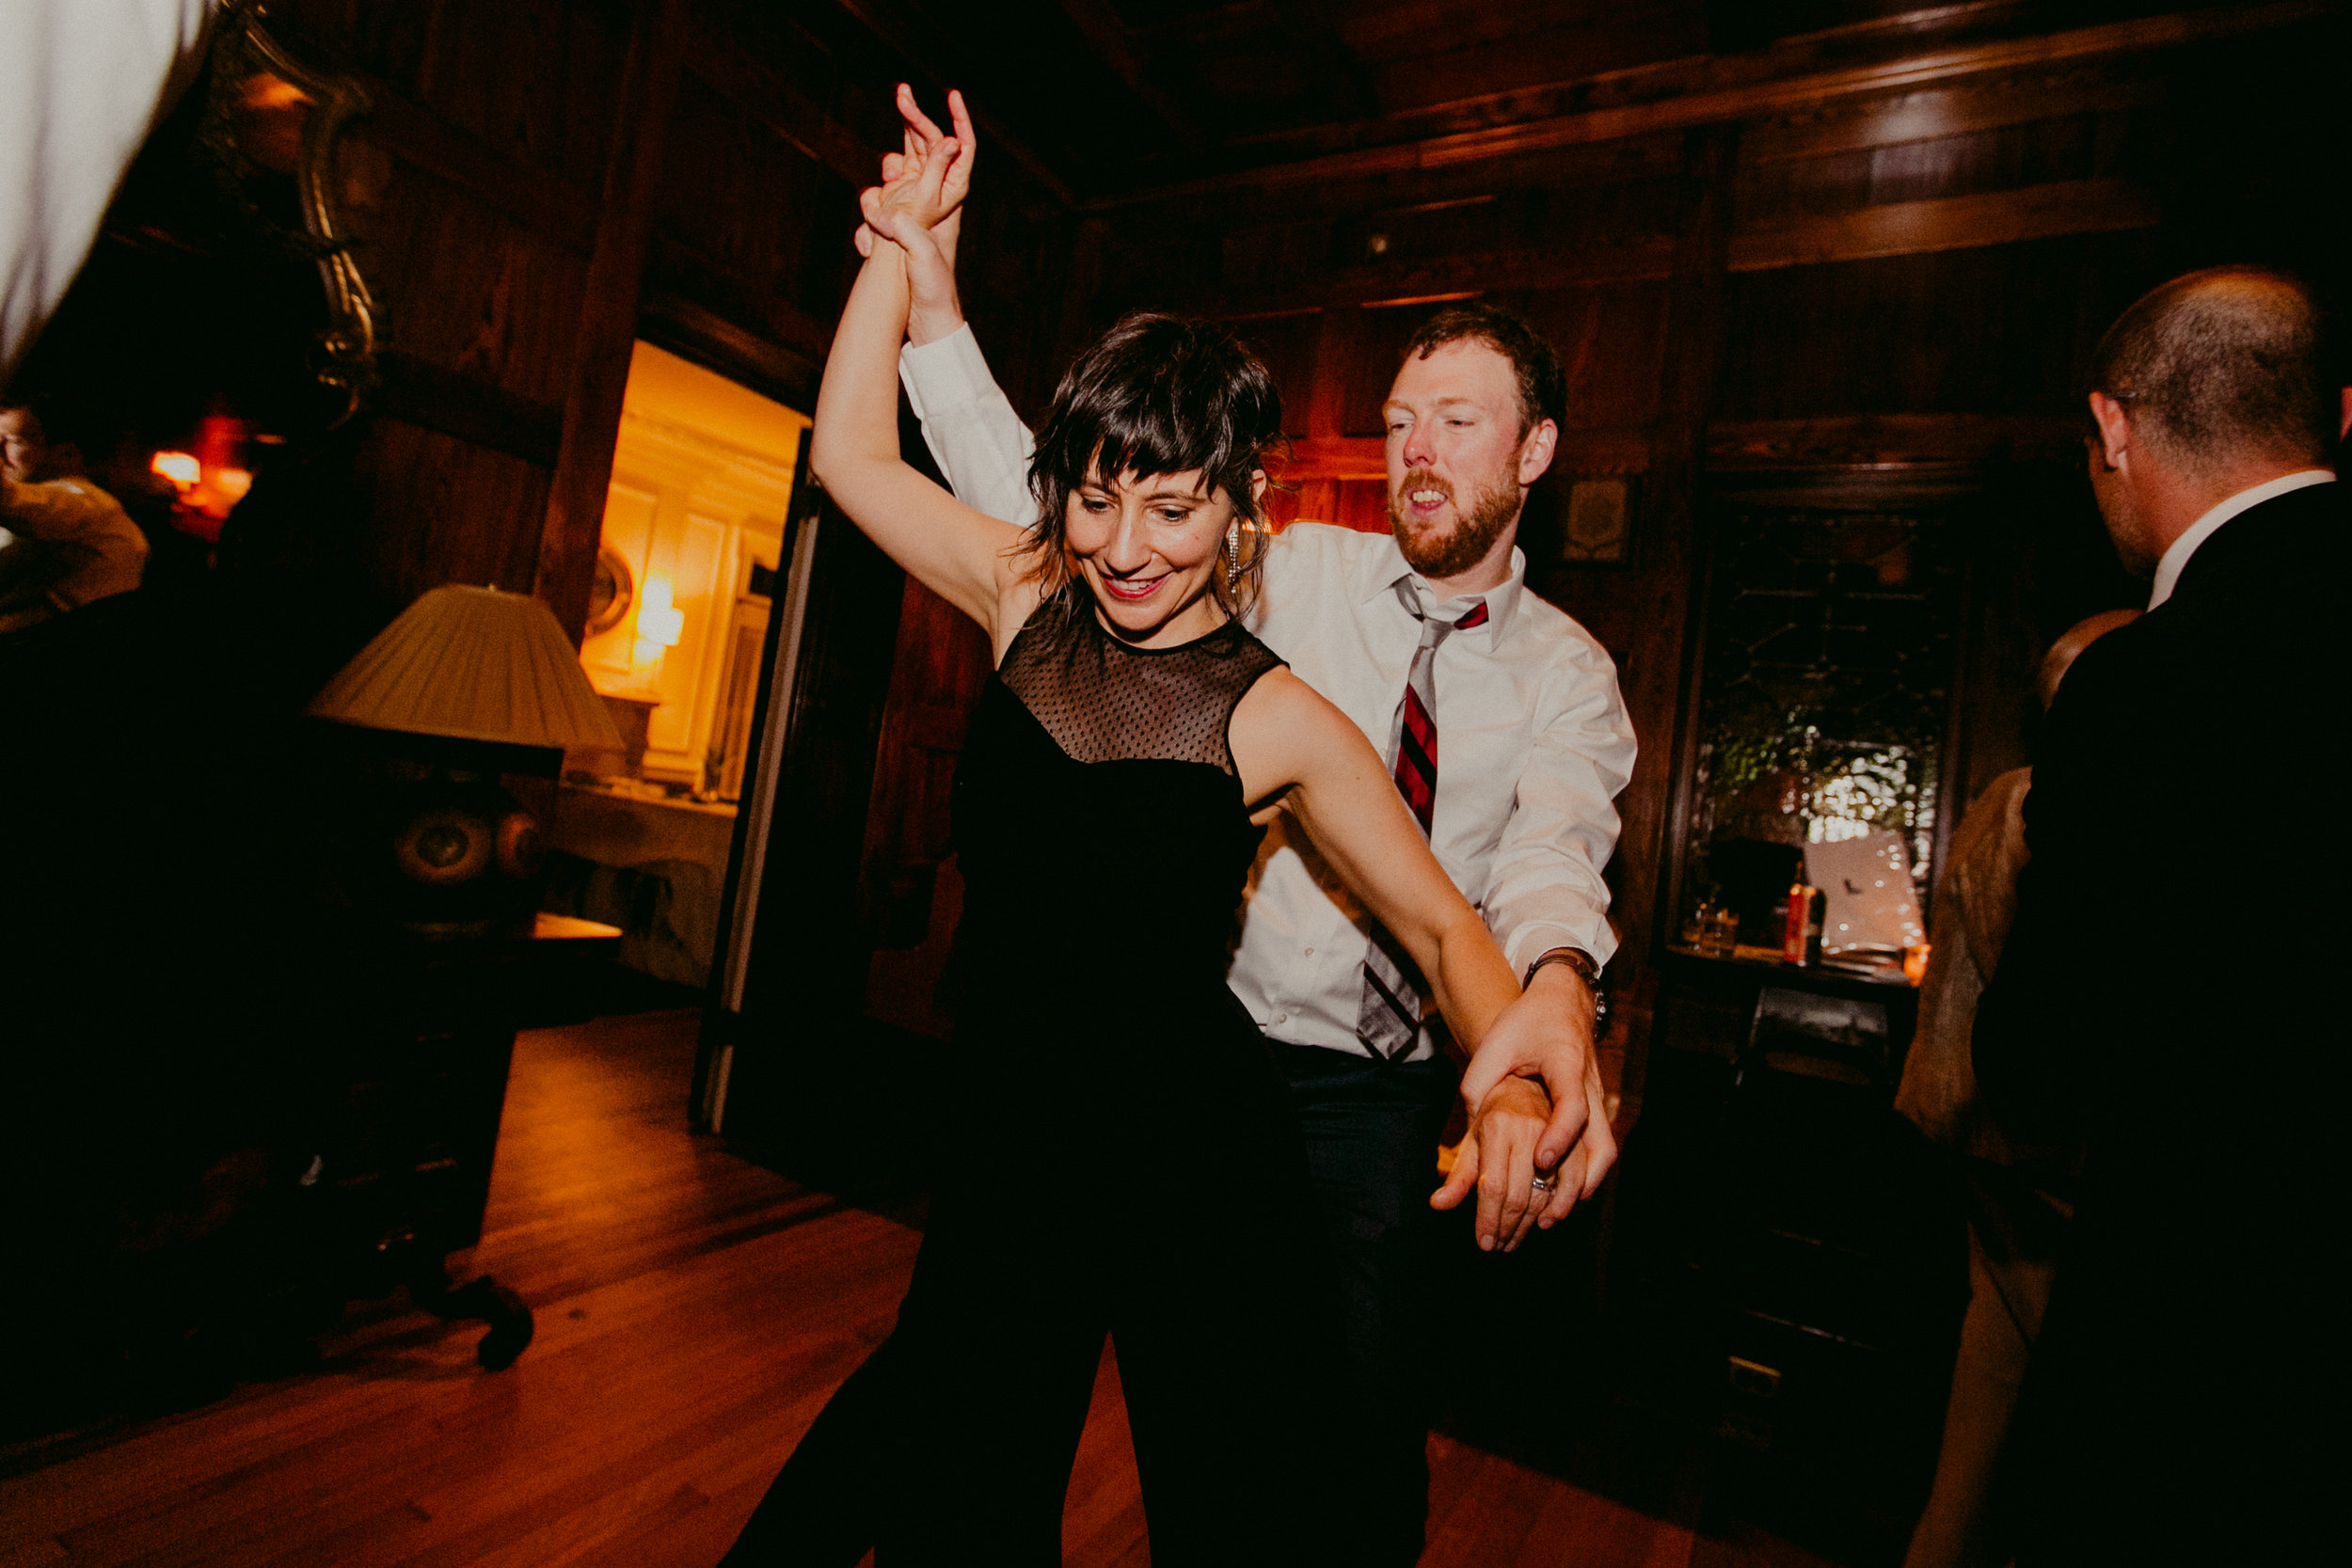 Tiger_House_The_Inn_at_Hudson-Wedding_Chellise_Michael_Photography-589.jpg